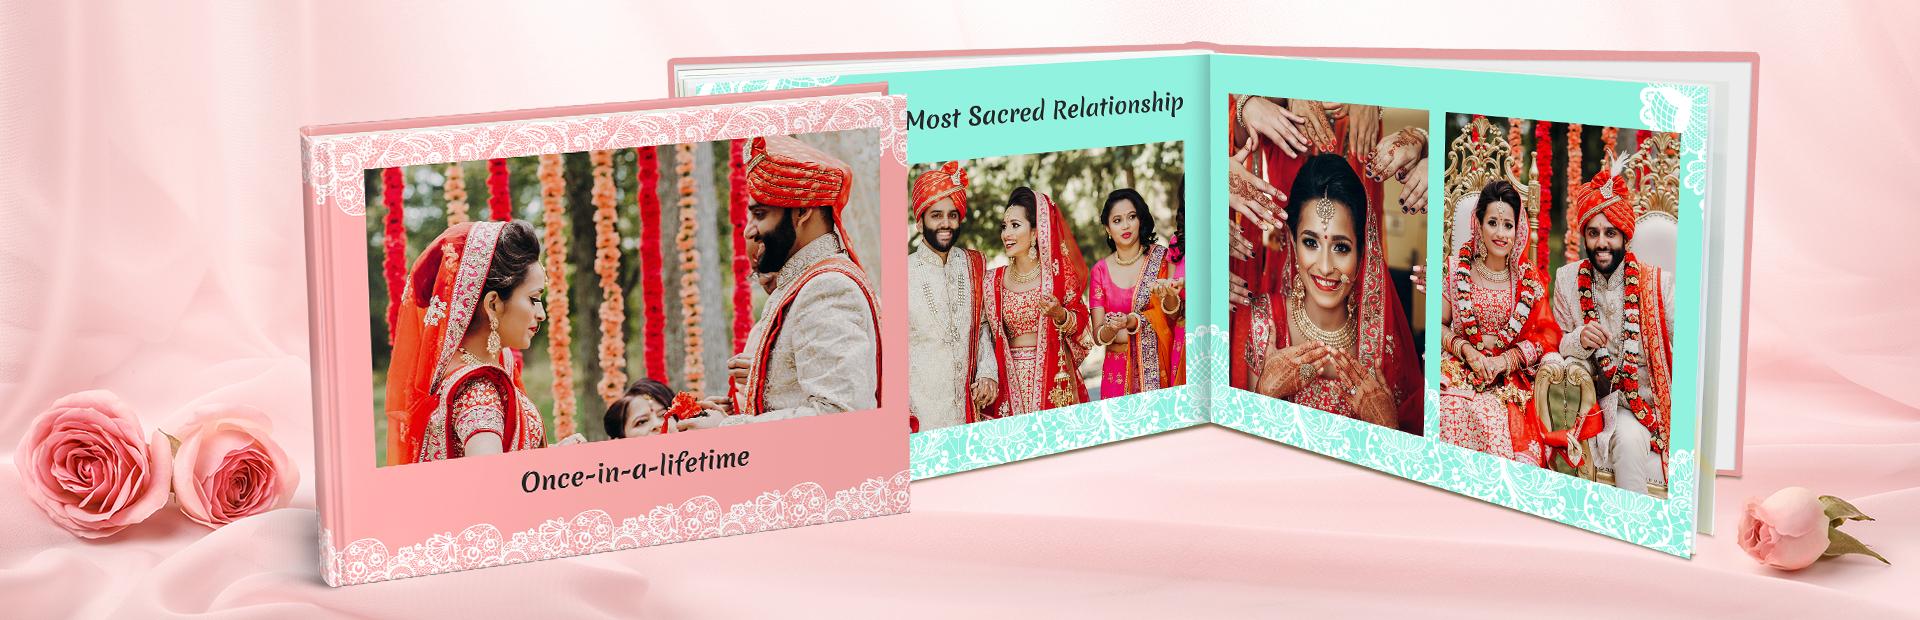 Wedding Romance Photo Book Printing